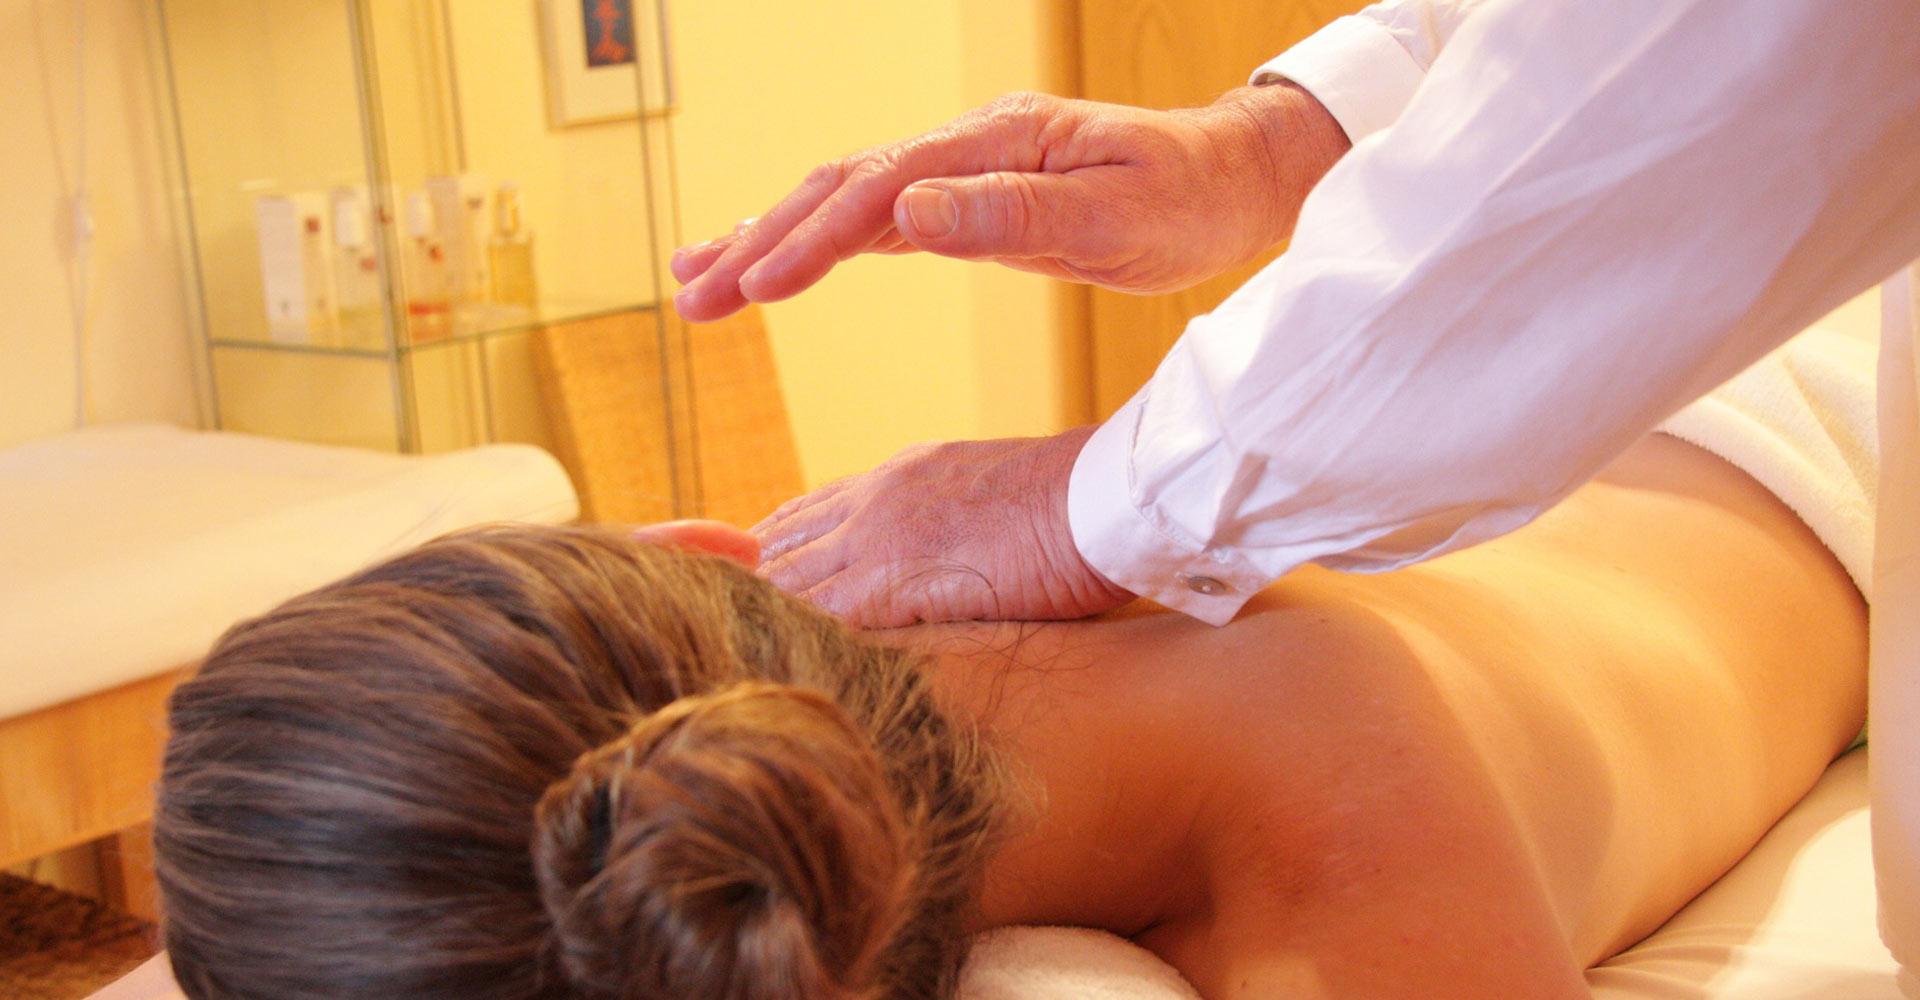 Premier Care Chiropractic